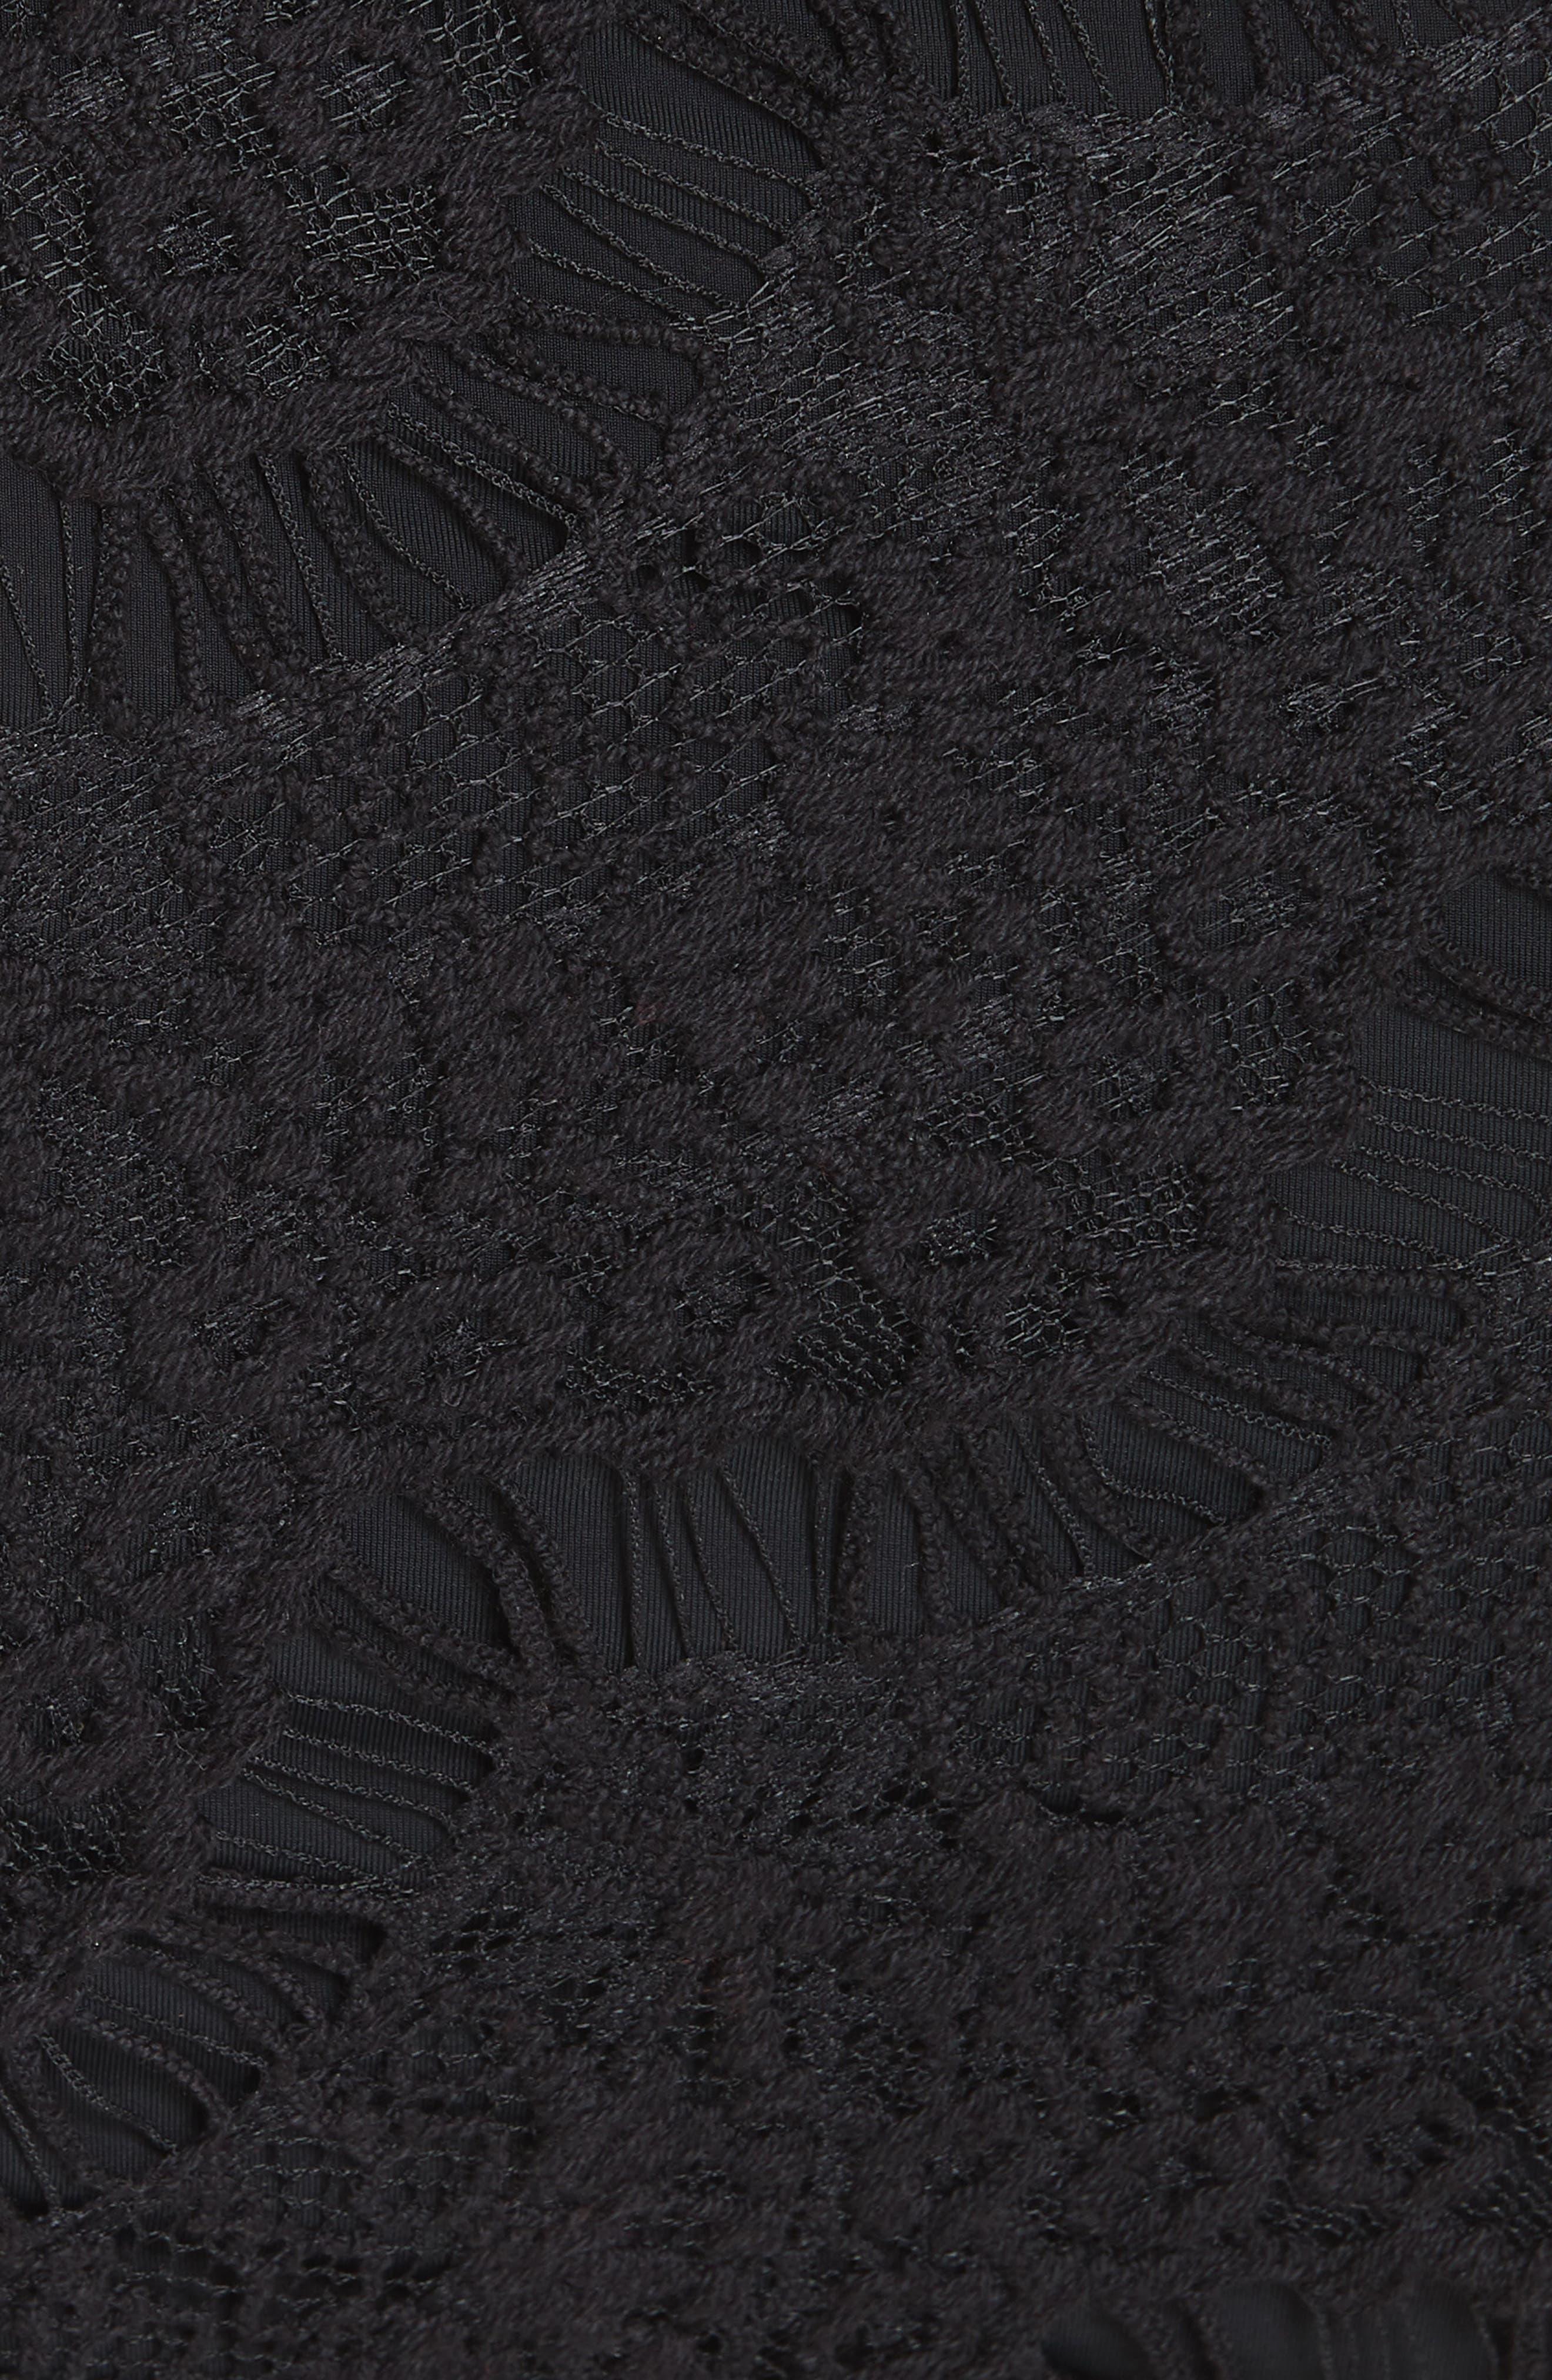 Sabina Crop Top & Skirt,                             Alternate thumbnail 5, color,                             BLACK